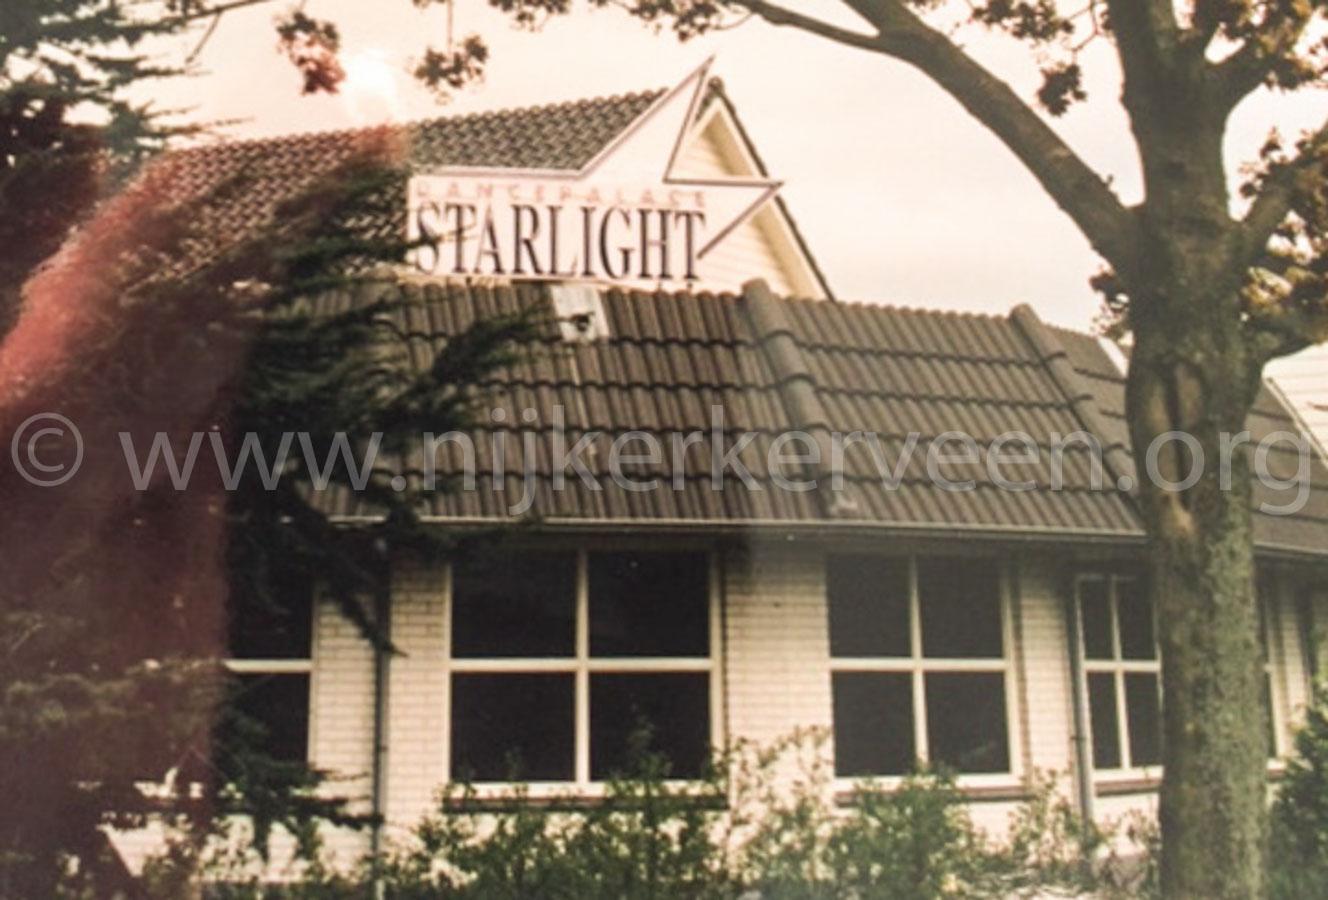 Starlight Nijkerkerveen